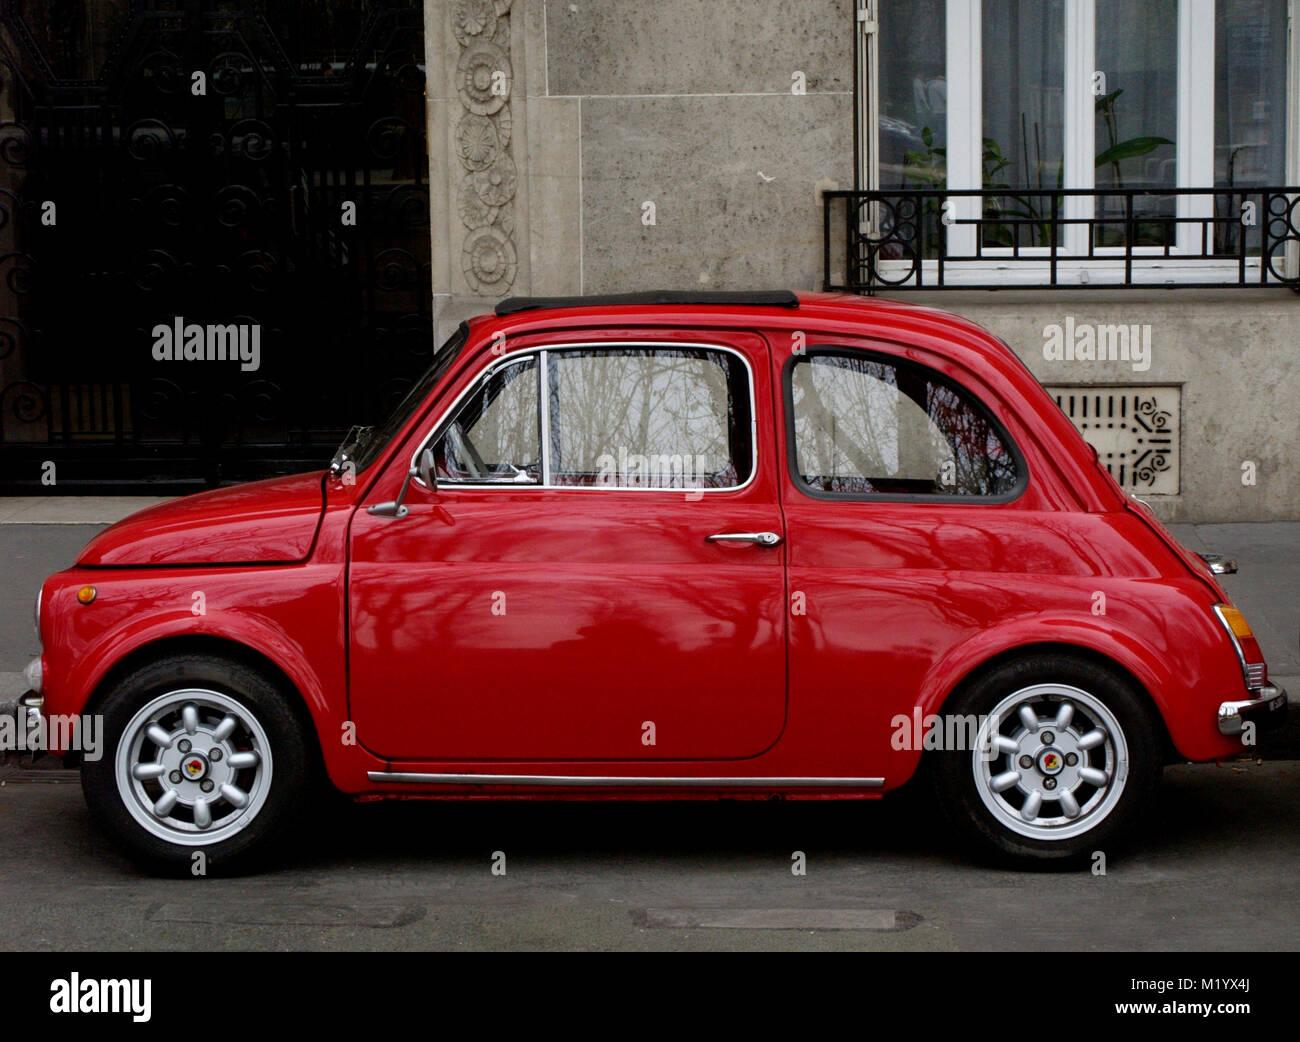 PARIS FRANKREICH - FIAT 500 ABART - italienische Oldtimer - SPORT AUTO - VERKEHR - PARIS PARIS AUTO - rotes Auto Stockbild